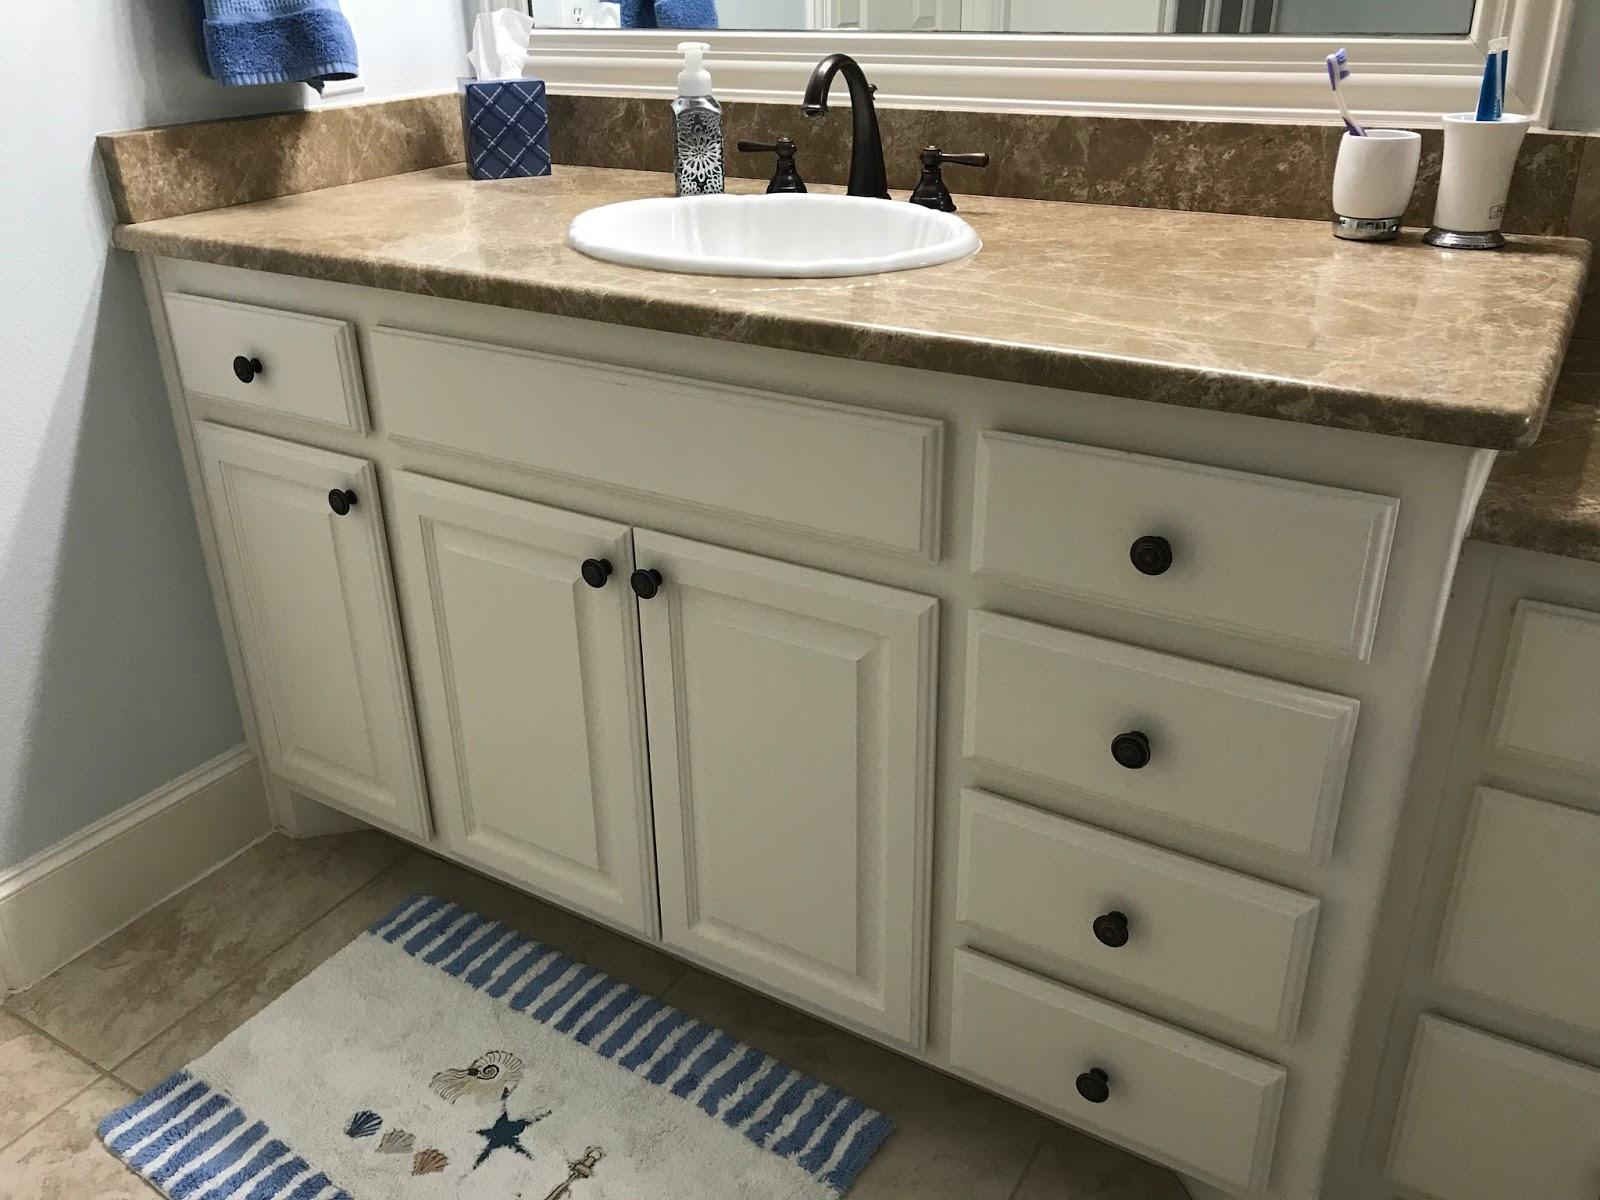 Busy Geemaw Bathroom Cabinet Knob Update